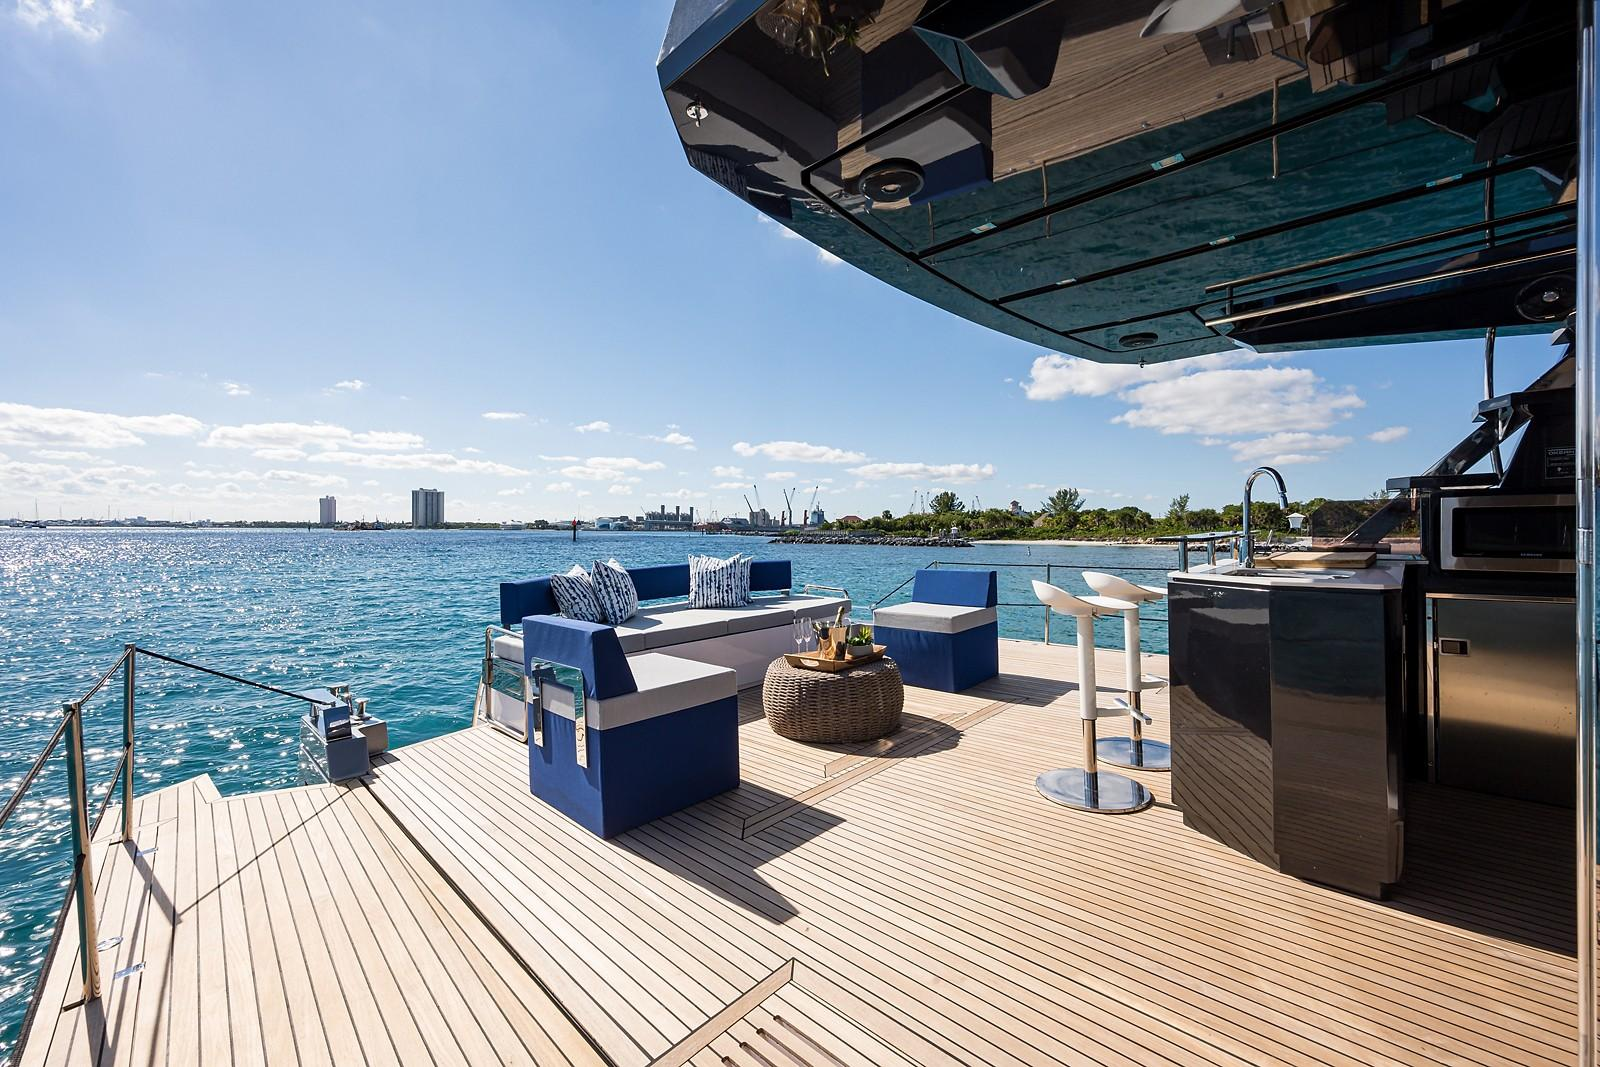 50X Okean Balconies Opened